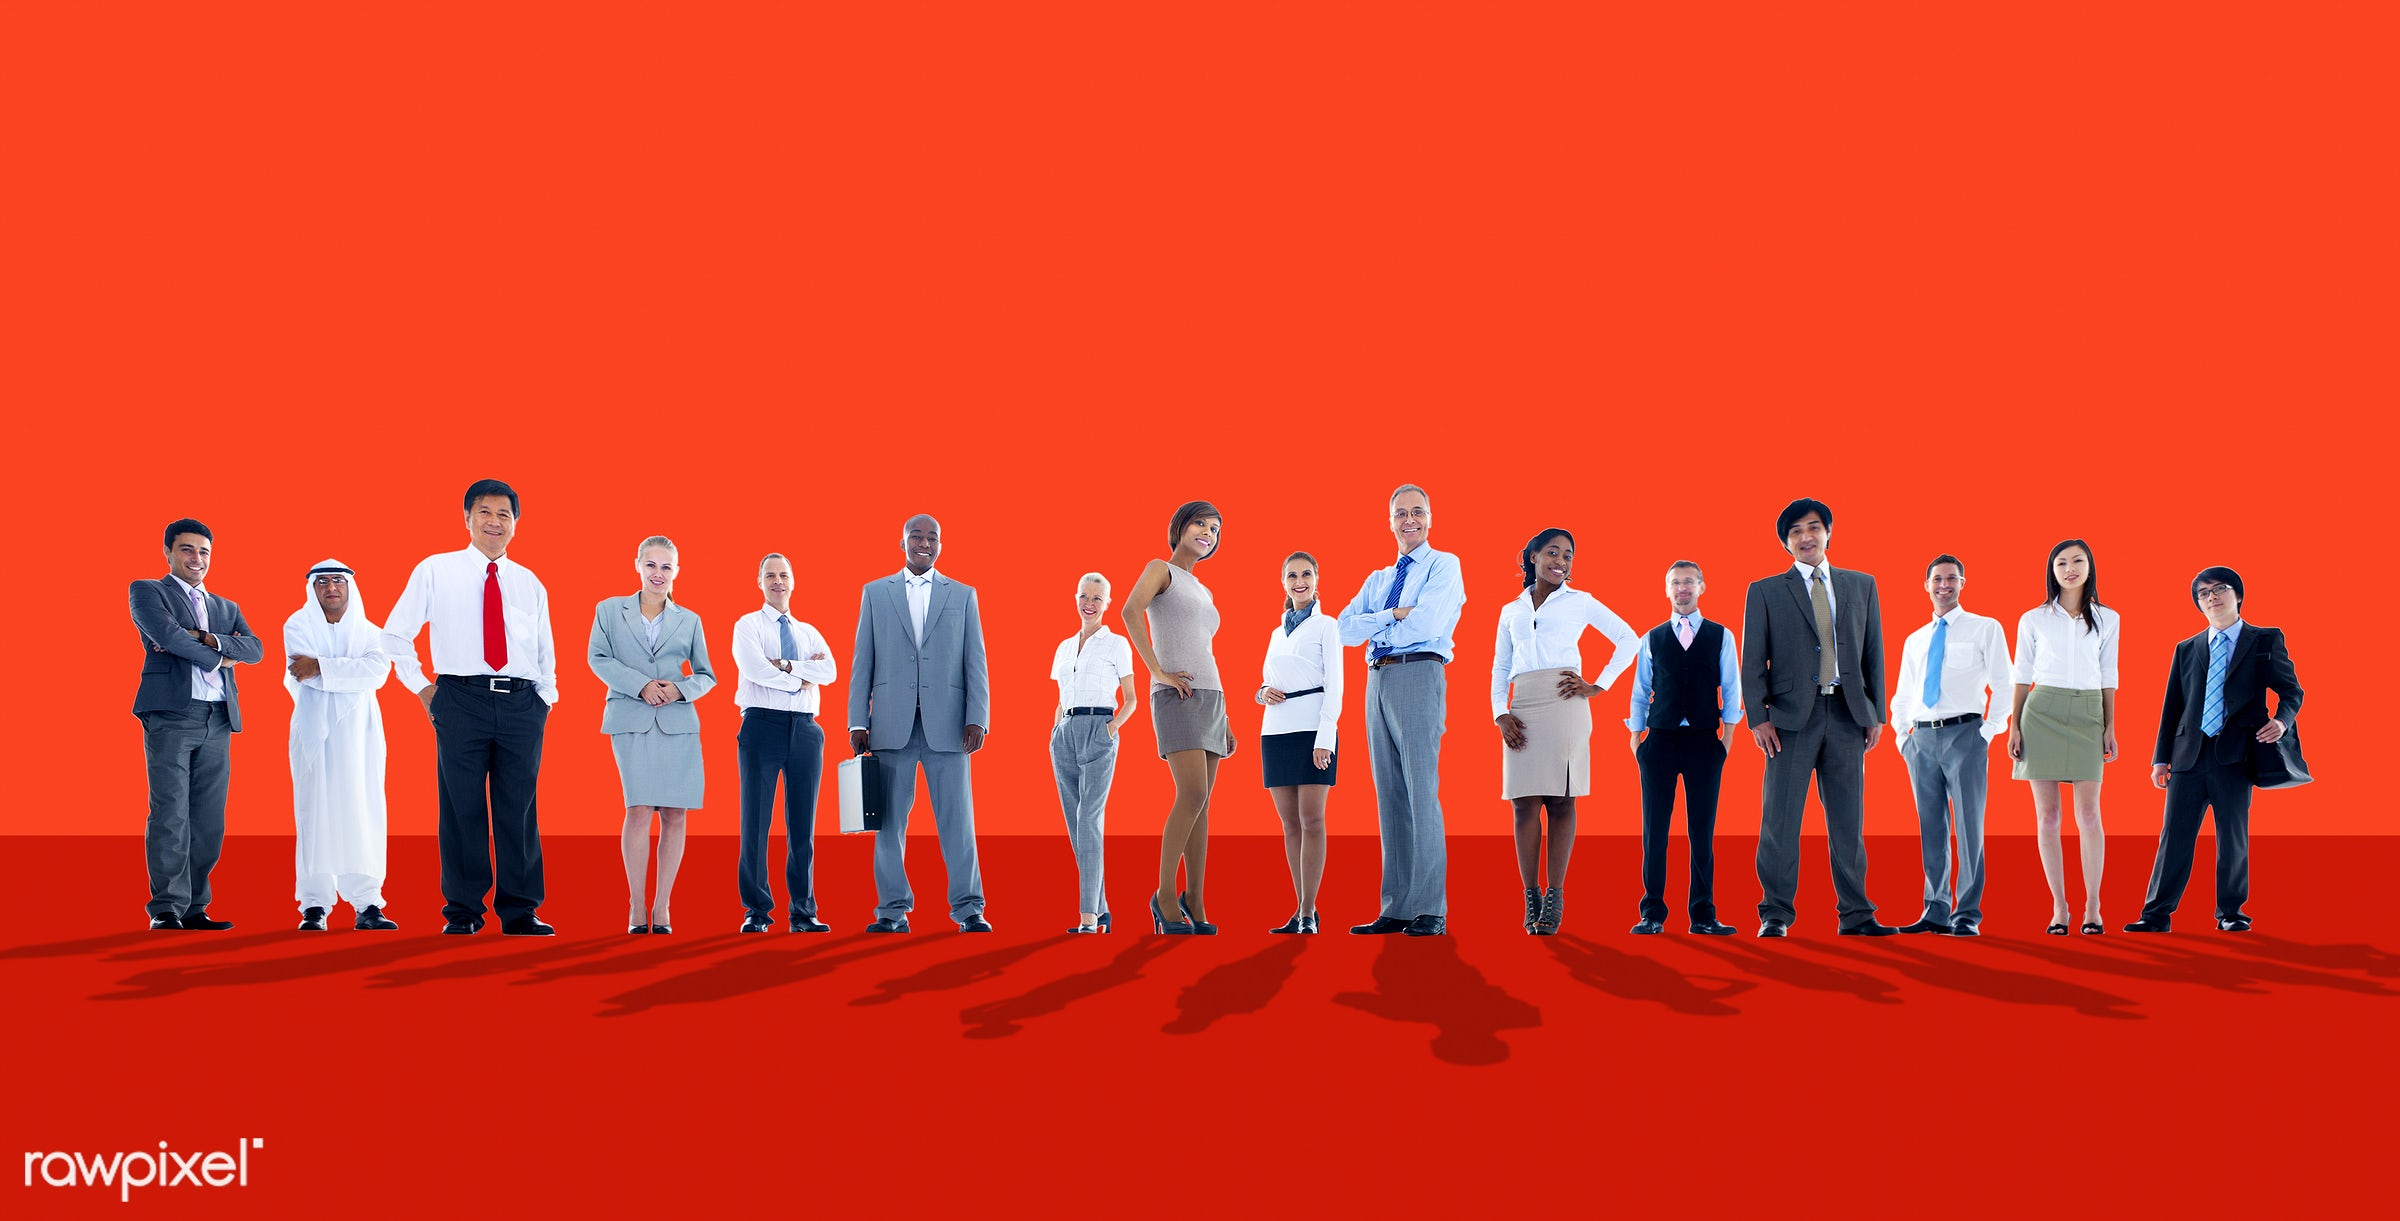 backdrop, background, business, business people, businessmen, businesswomen, corporate, diverse, diversity, ethnic,...